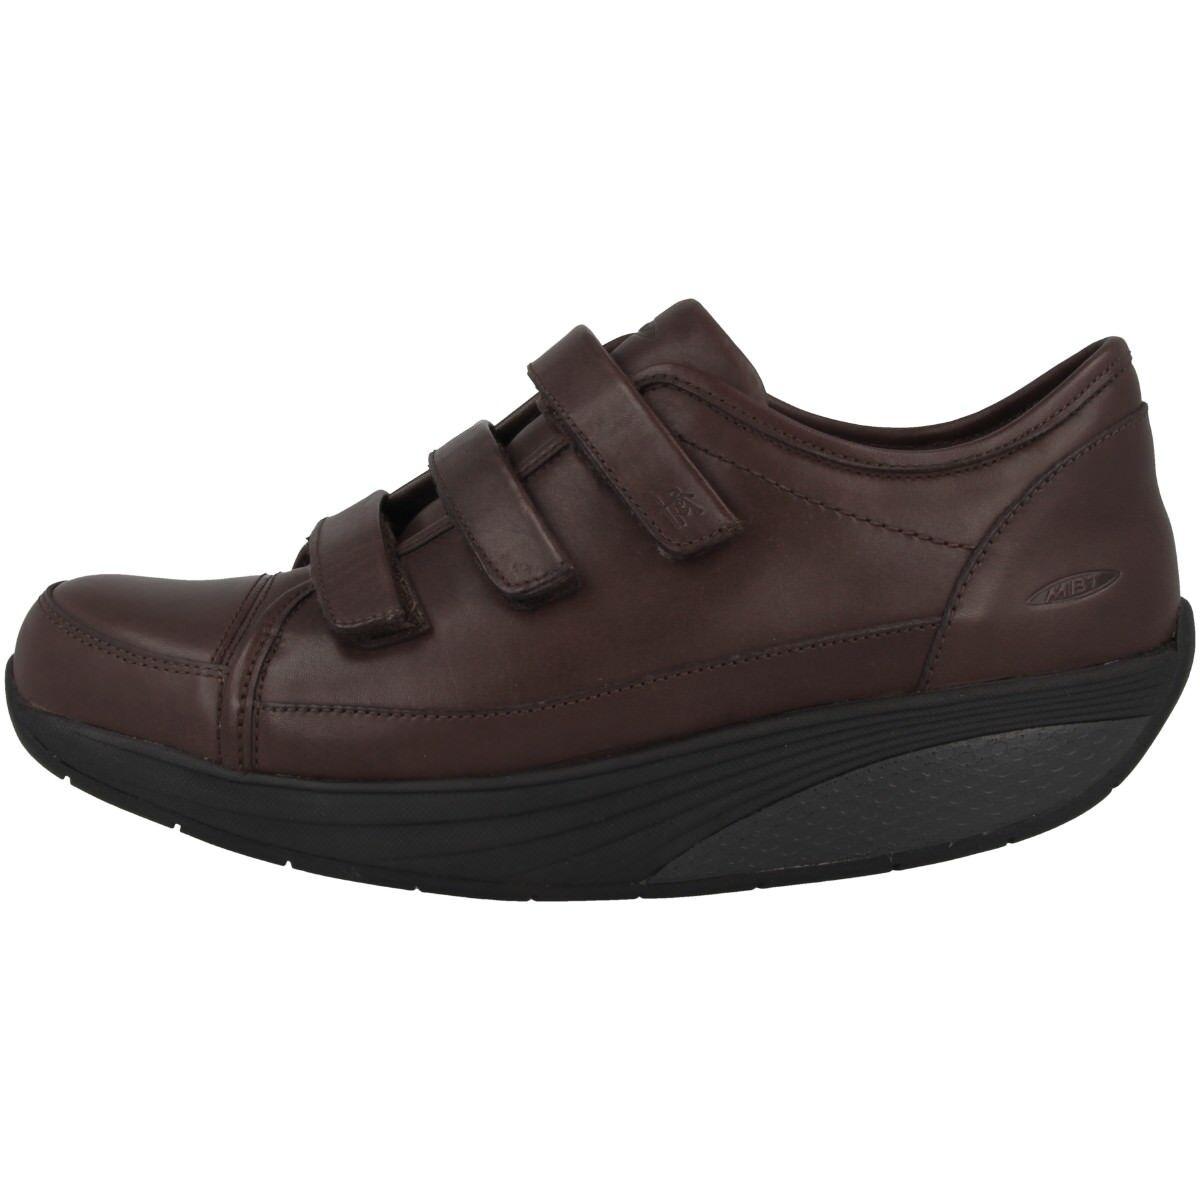 MBT Nafasi S Strap Damens 700600-118N Schuhe Damen Fitness Gesundheitsschuhe 700600-118N Damens a06b28